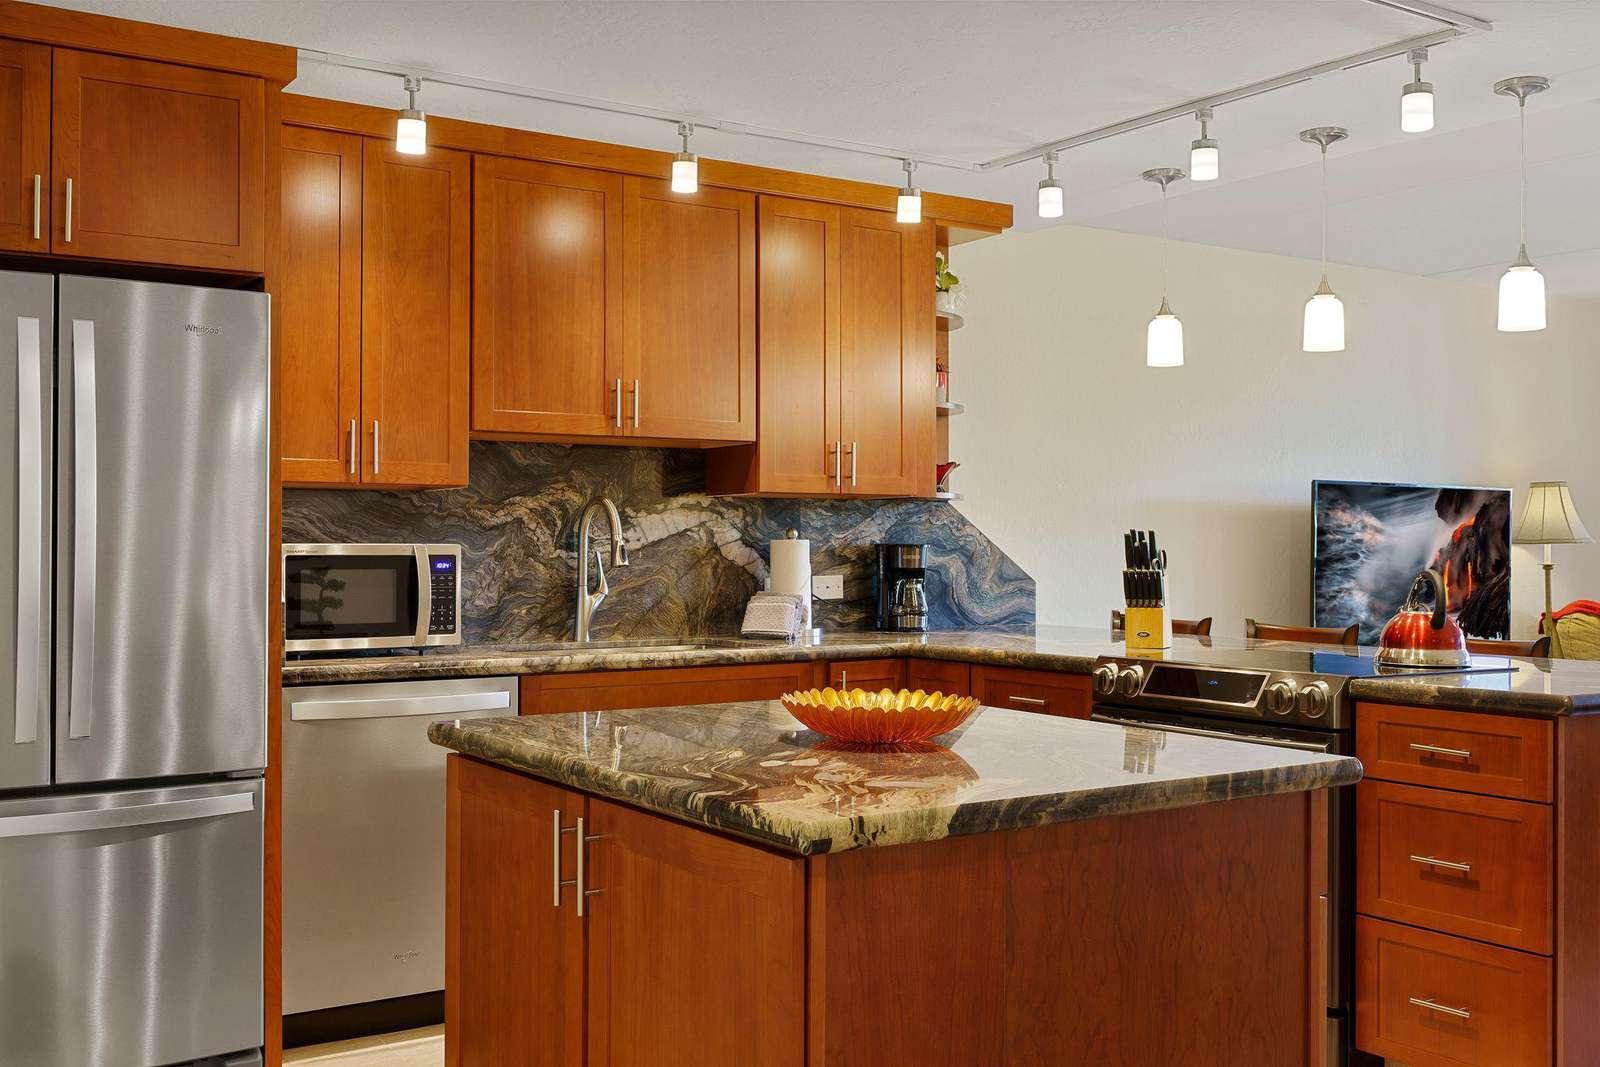 Complete kitchen renovation 2020!